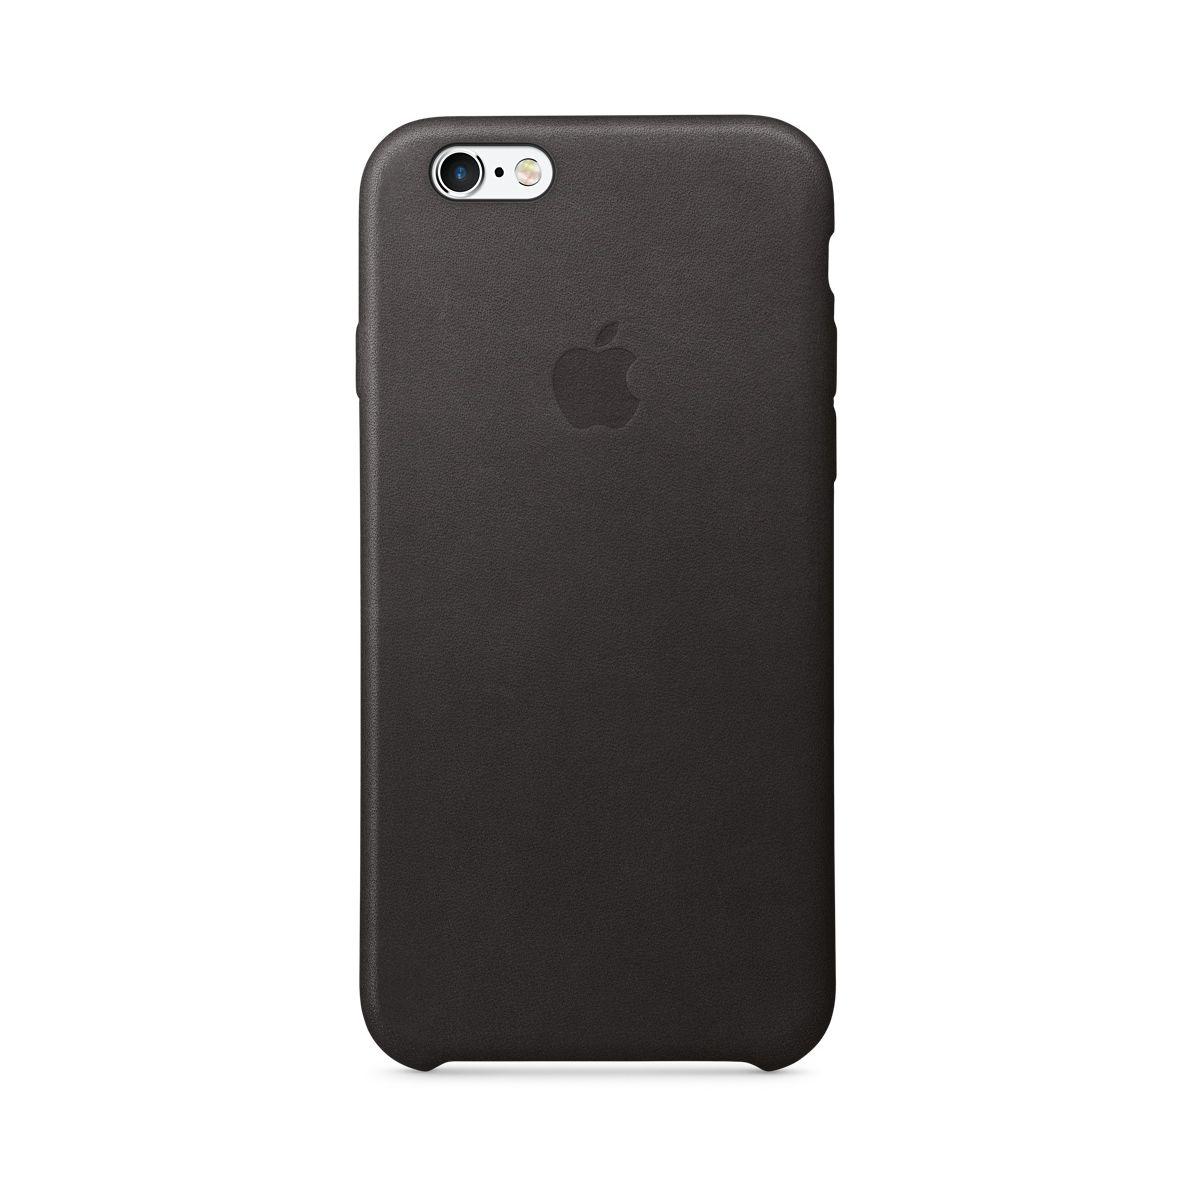 Coque APPLE iPhone 6s cuir noir (photo)